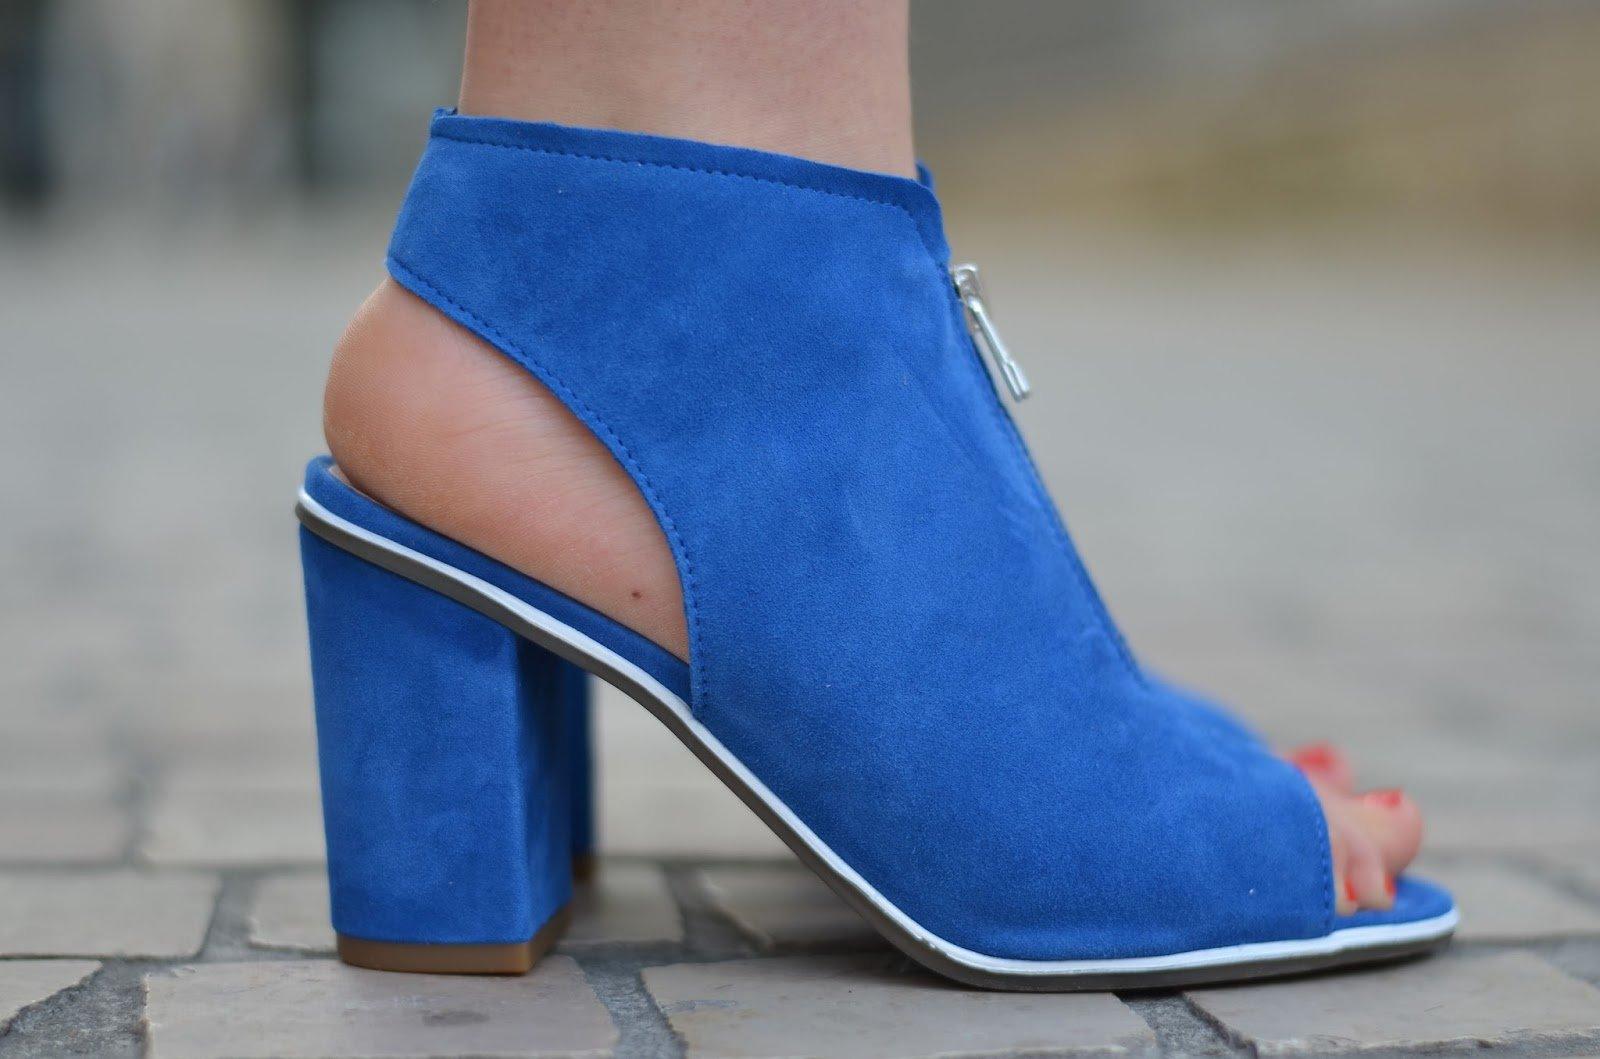 Sandale bottines ouvertes bleu